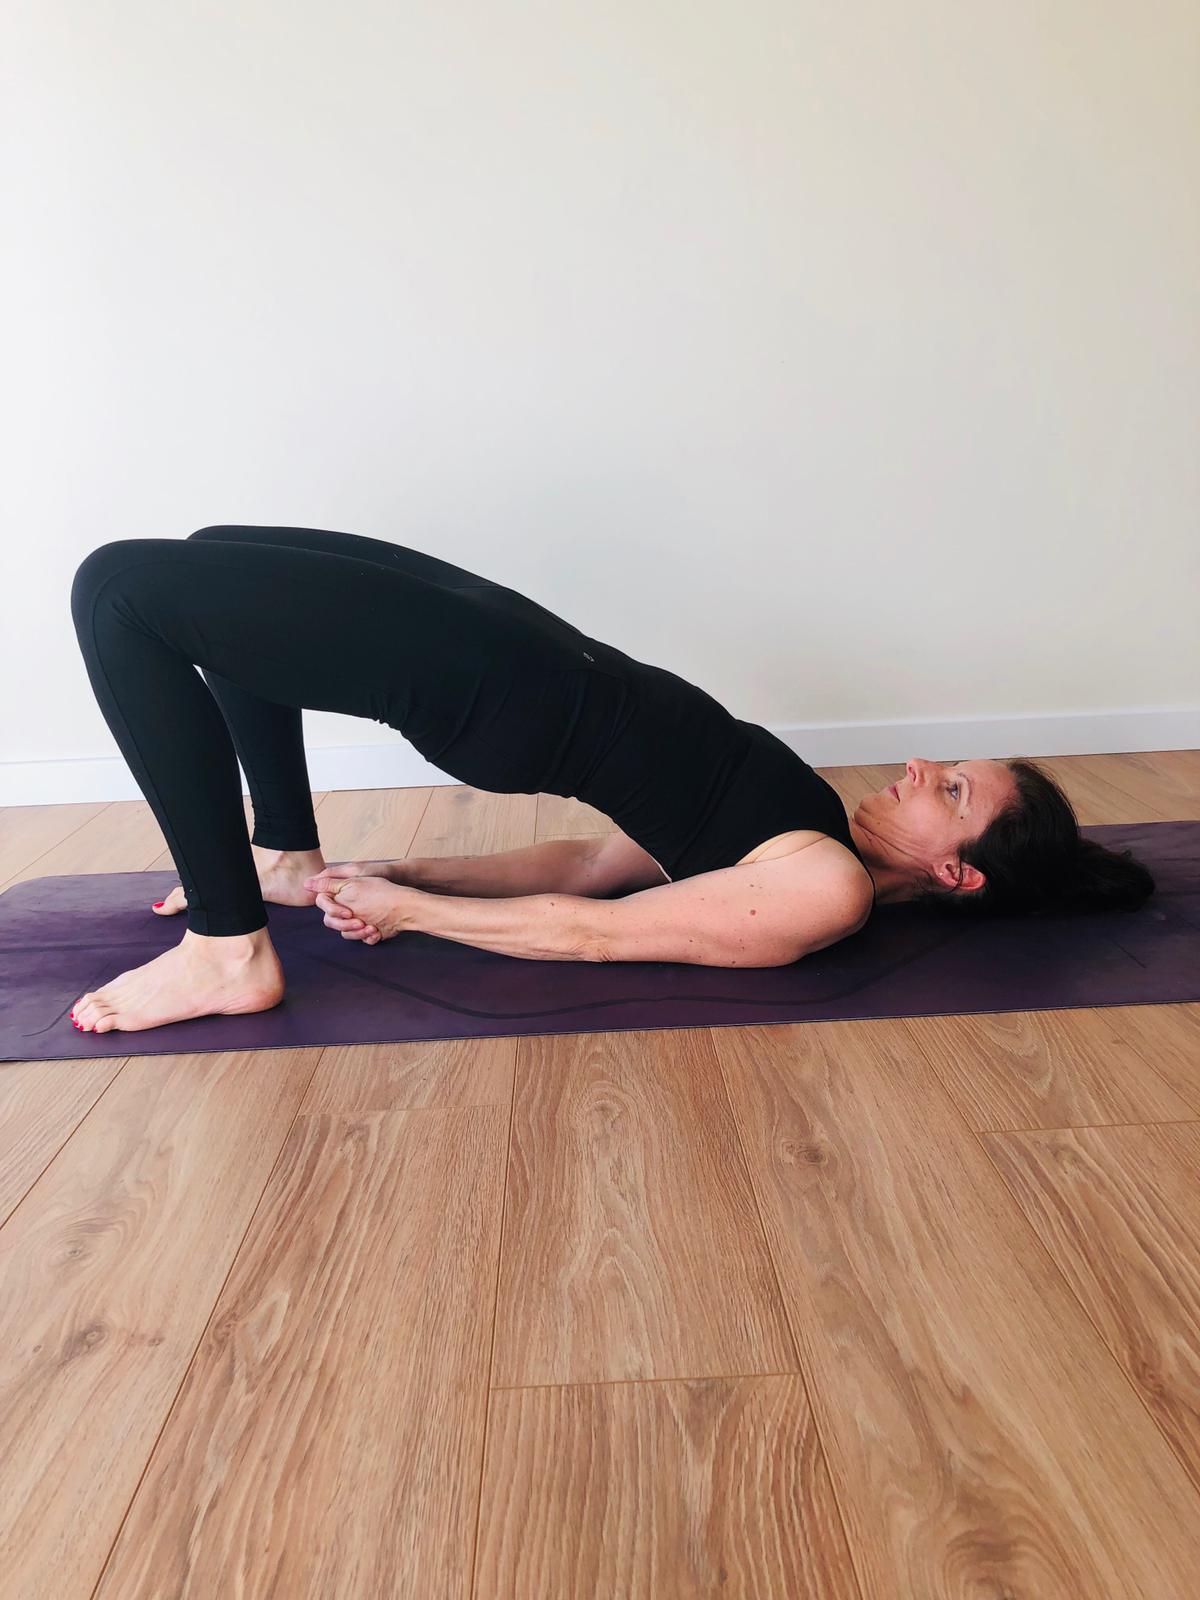 ensemble de yoga noir